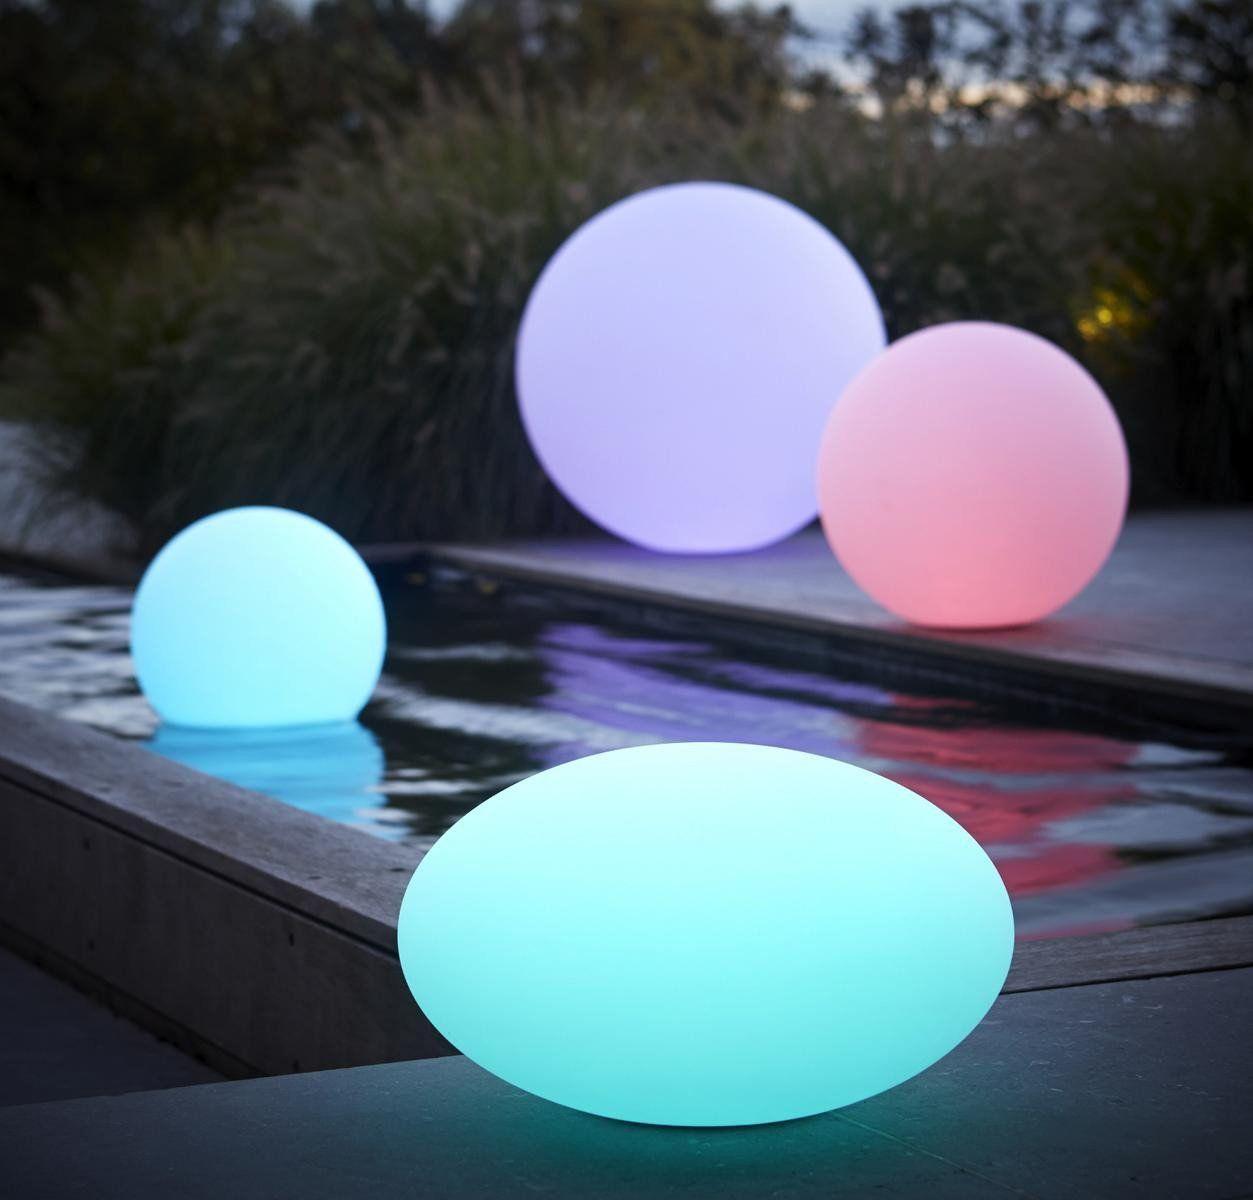 Lampadaire Lampes Borne Jardin Boule Lumineuse Lumineux Led